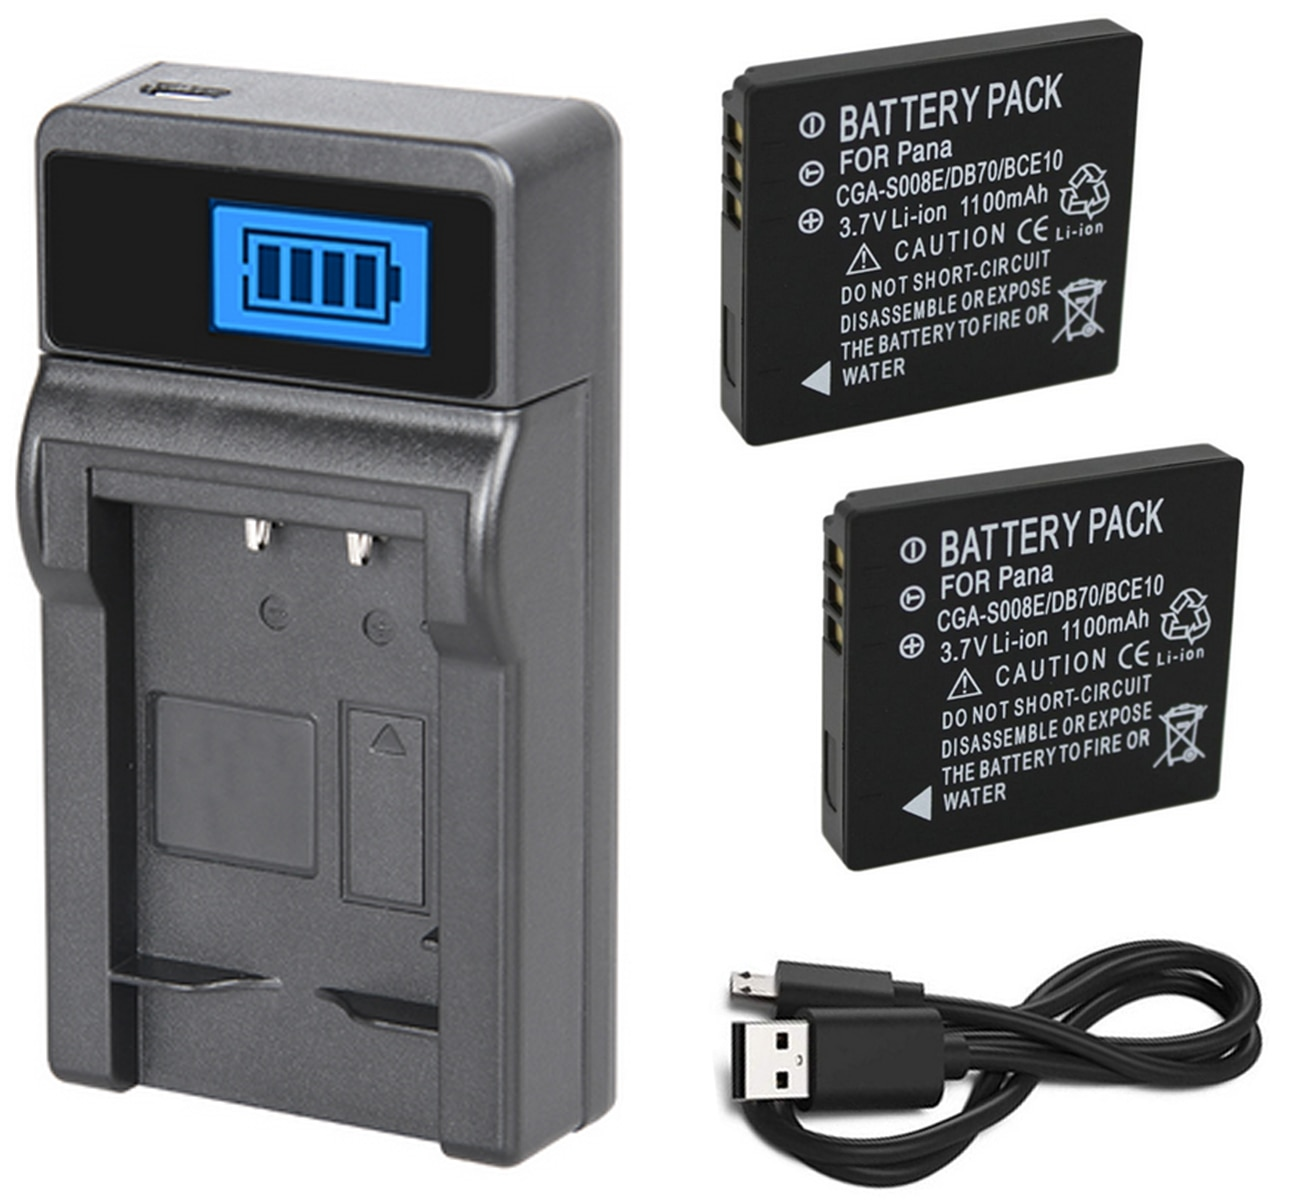 Batería (2 paquetes) + cargador para Panasonic Lumix DMC-FX30, DMC-FX33, DMC-FX35, DMC-FX36, DMC-FX37, DMC-FX38 cámara Digital